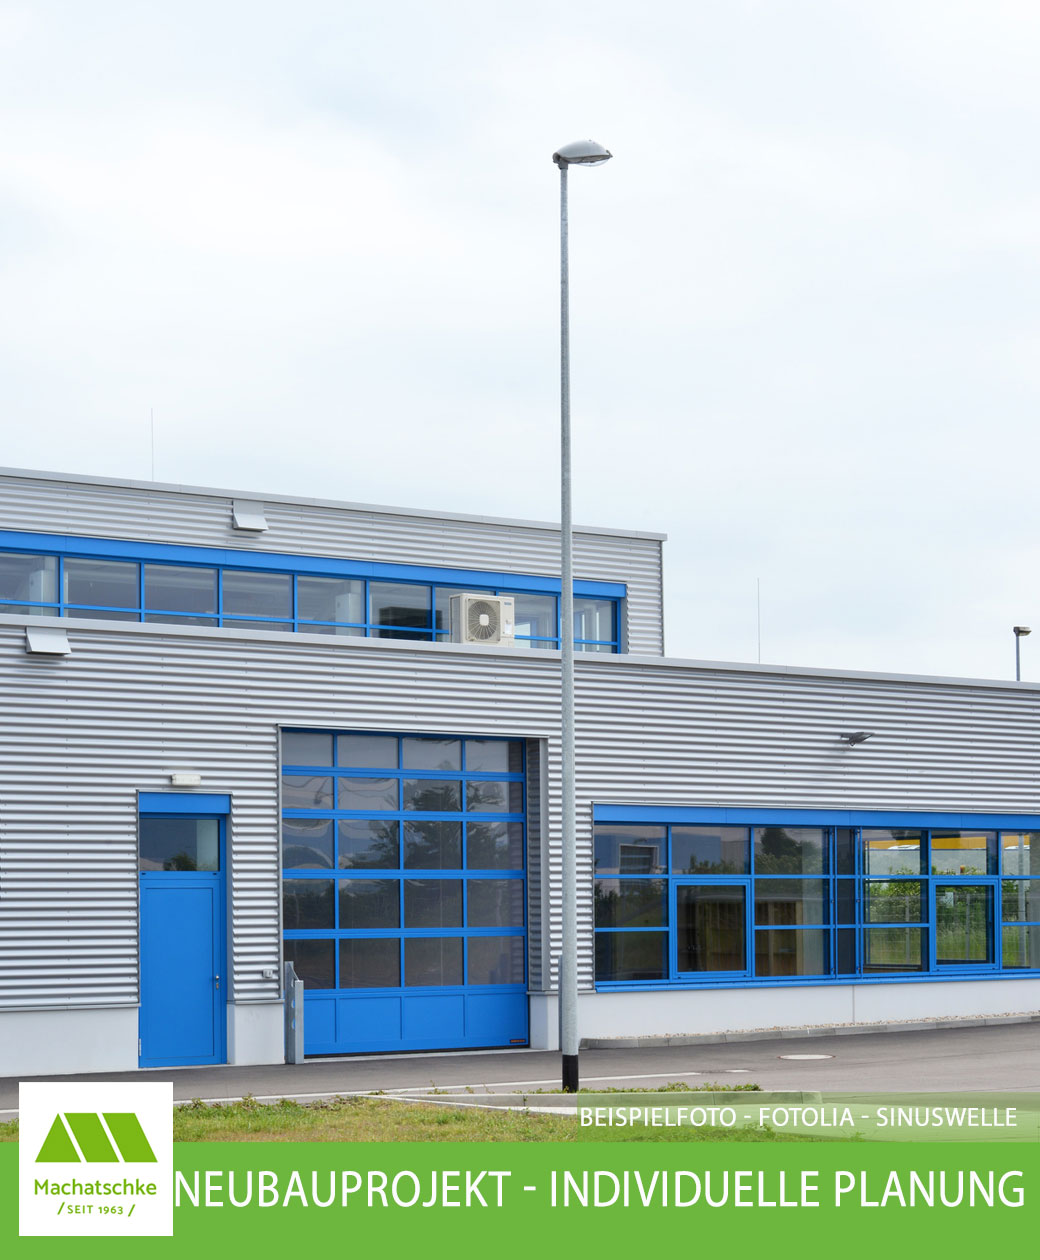 Neubauprojekt - Individuelle Planung - Lager- Produktionsfläche - Bürofläche